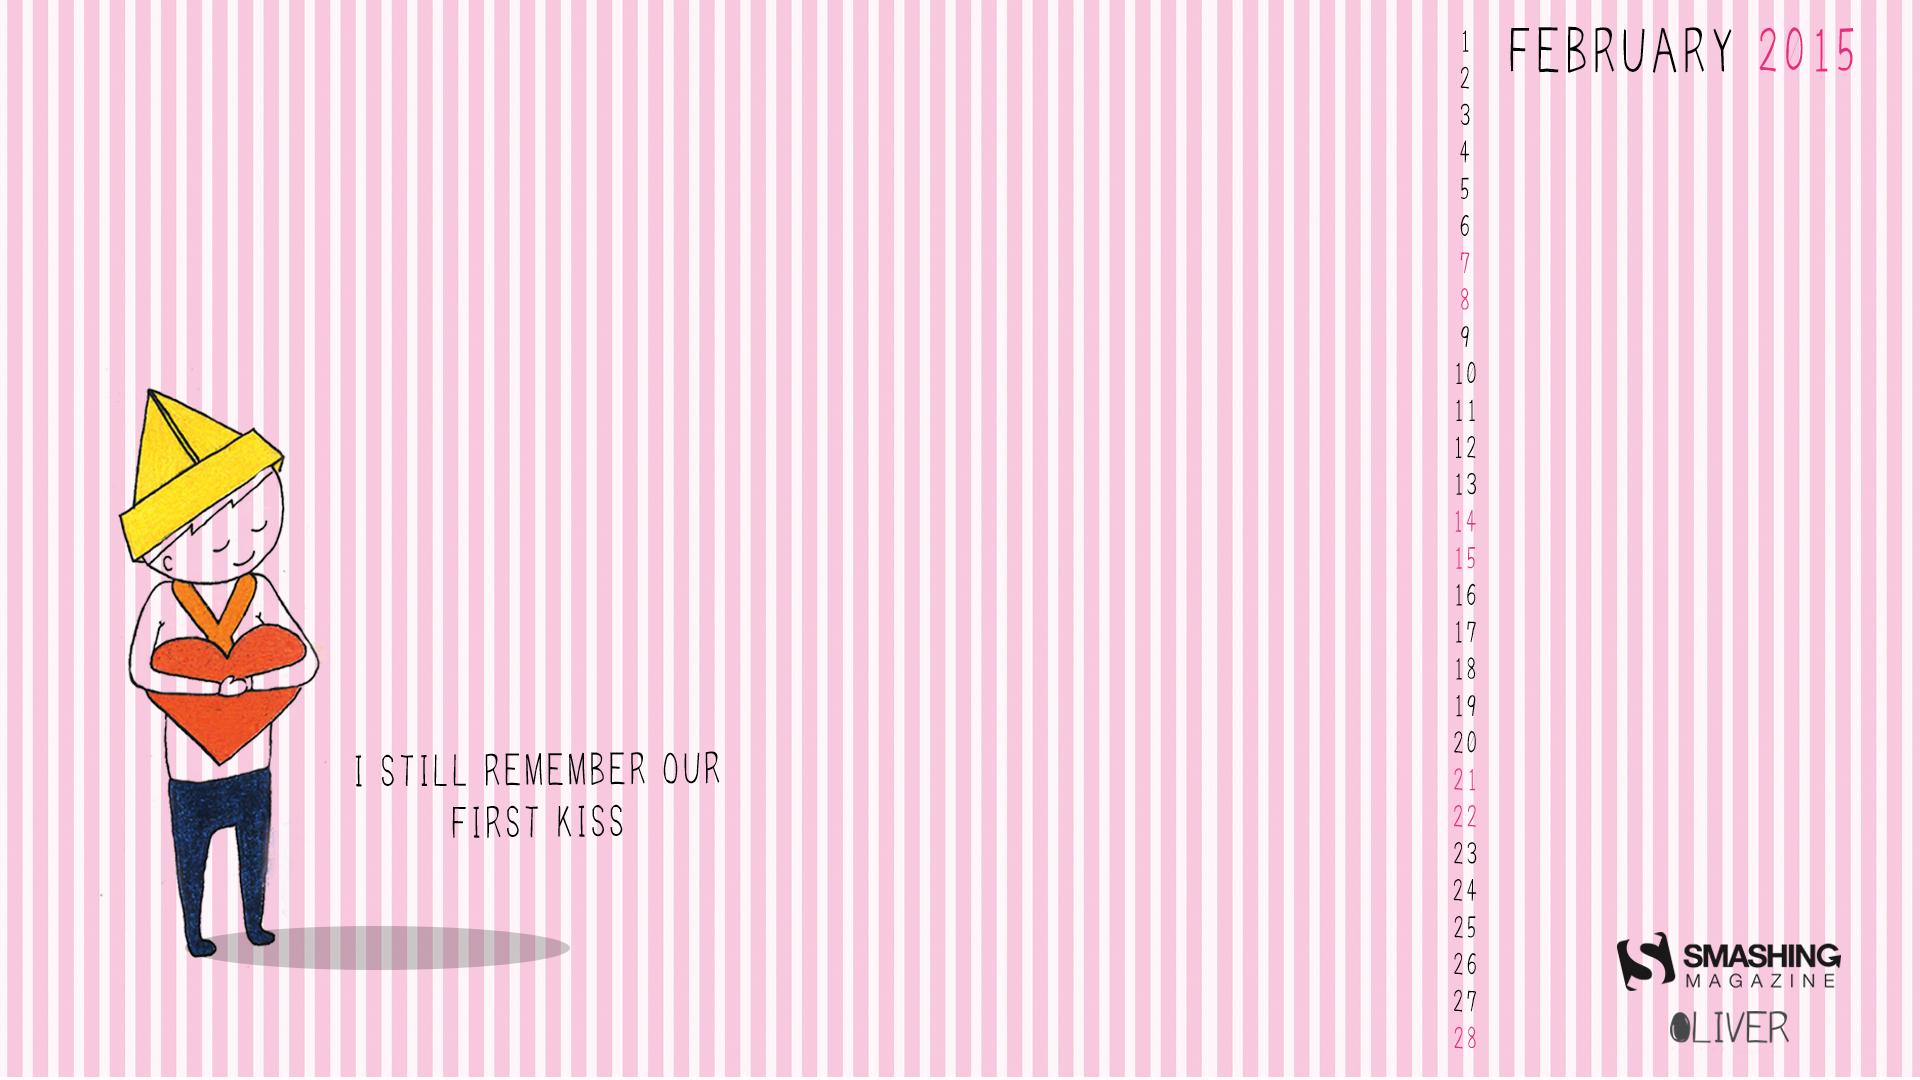 Desktop Wallpaper Calendars February 2015   Print2Web 1920x1080